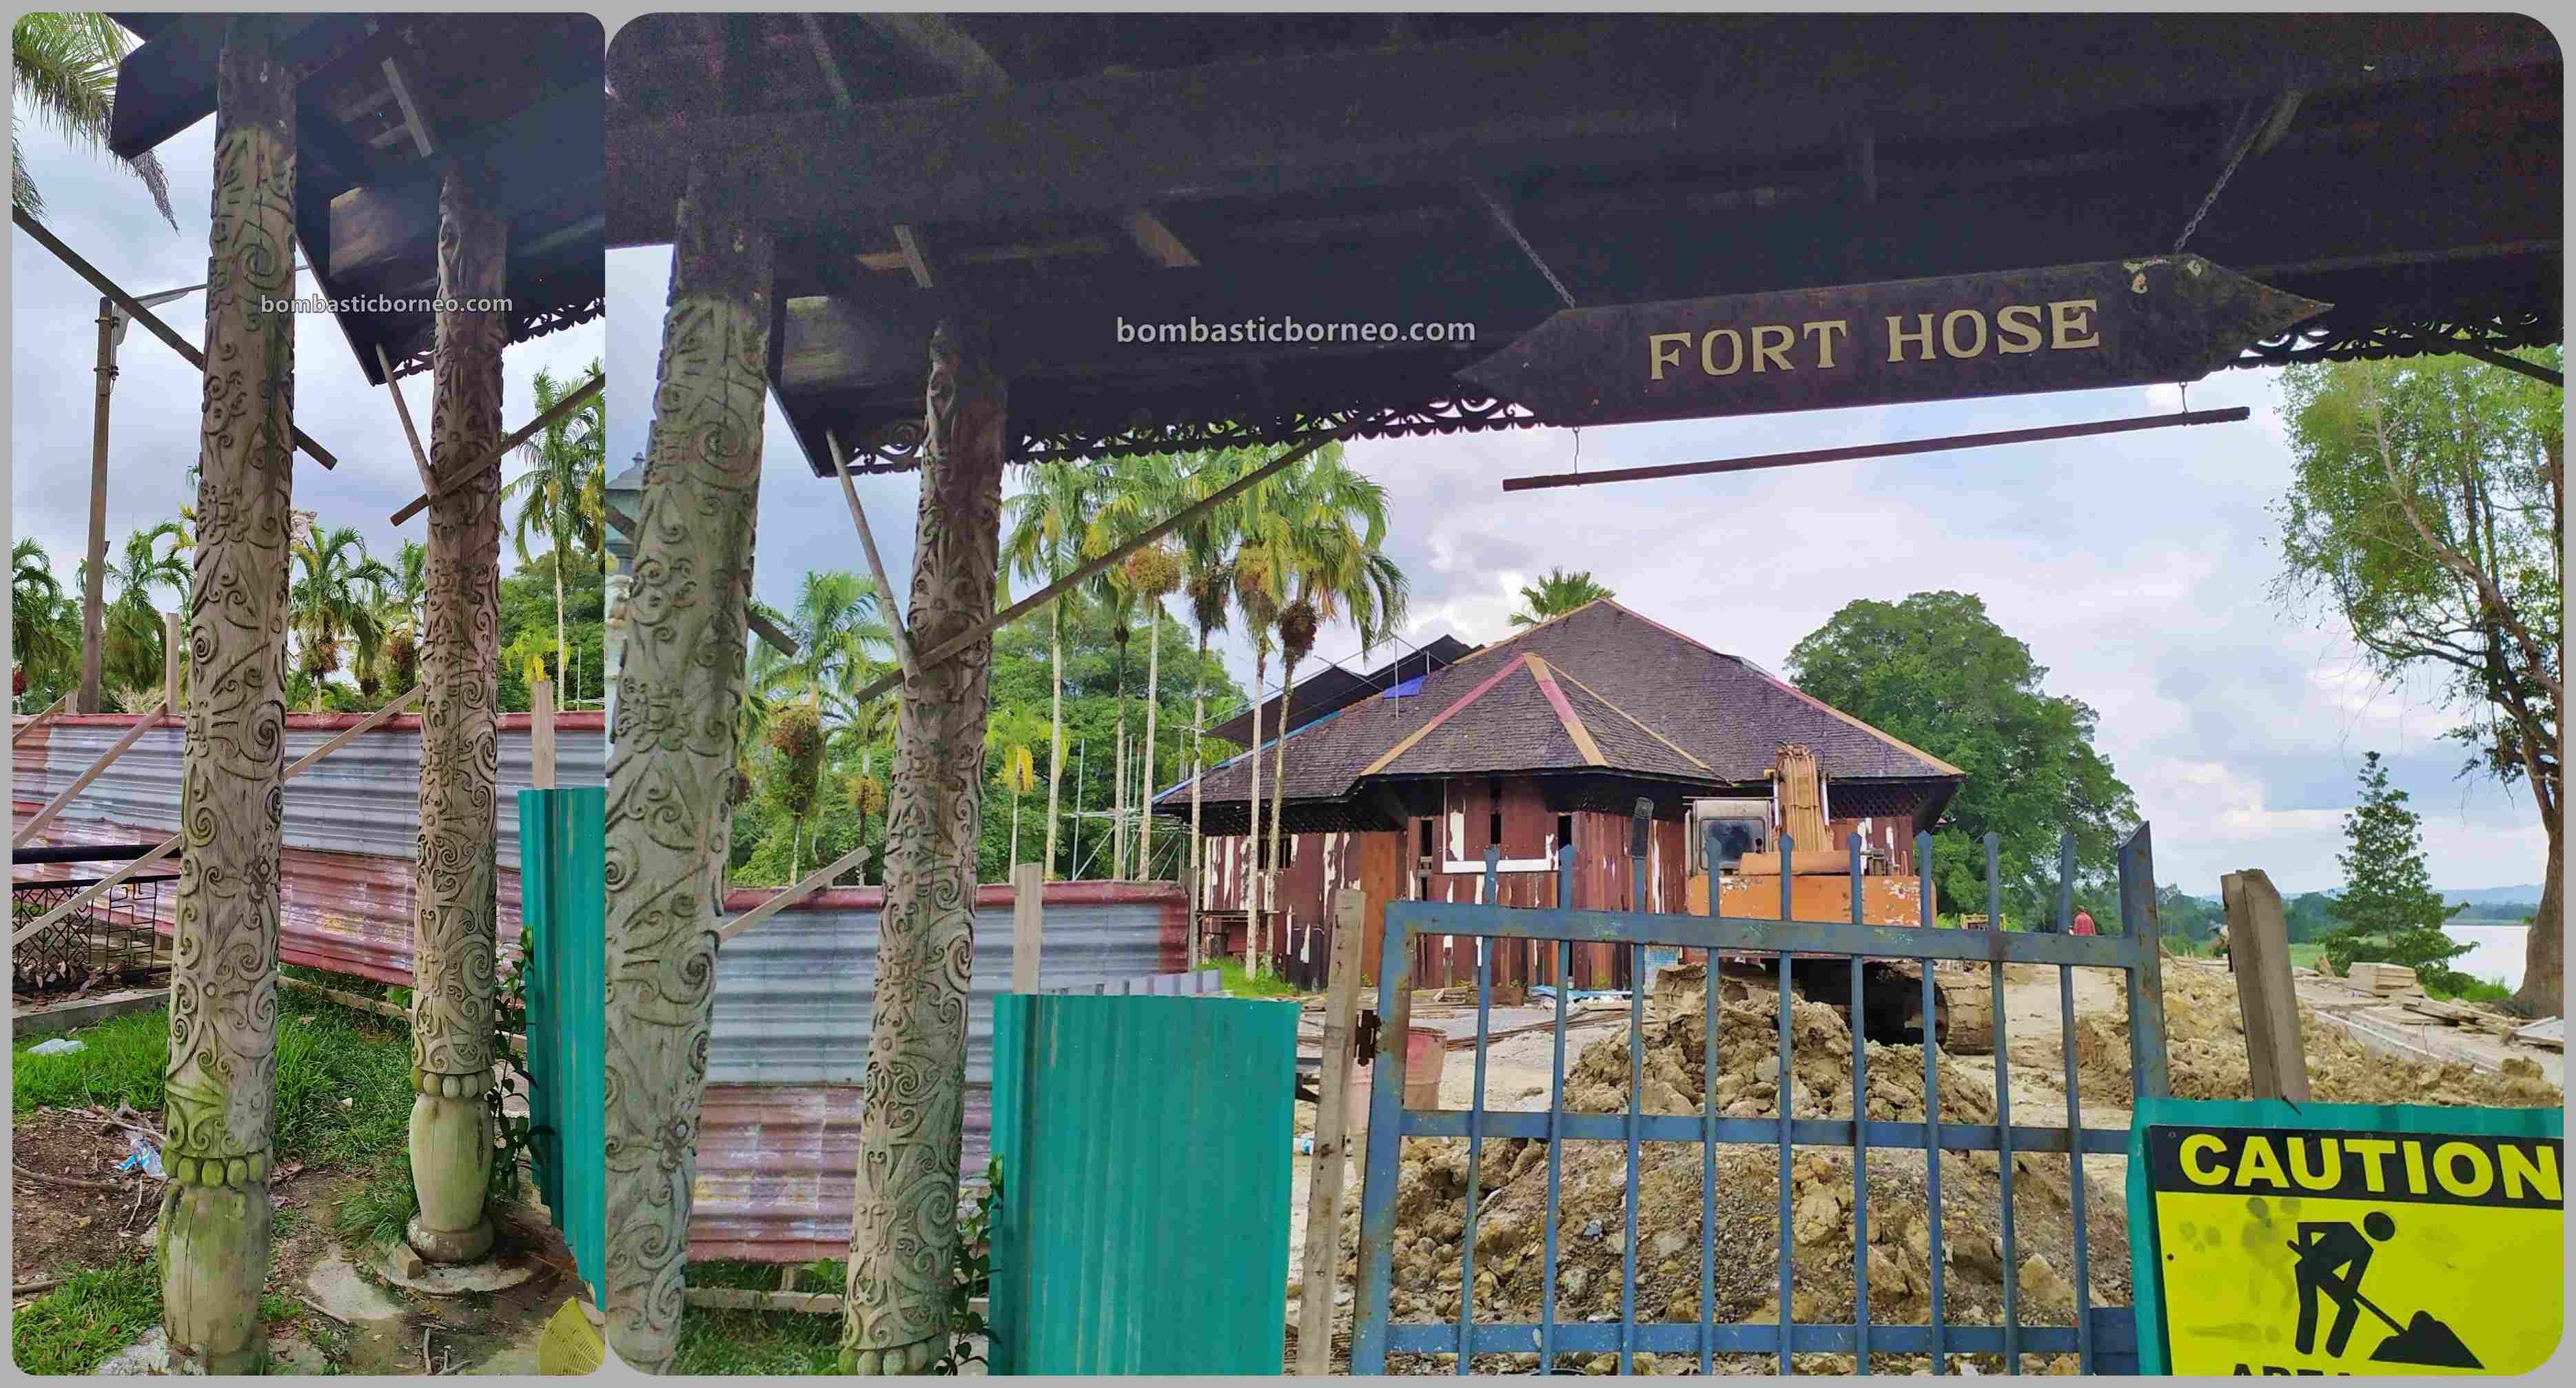 backpackers, Destination, exploration, Kubu Hose, muzium, Miri, town, Tourist attraction, travel guide, Cross Border, Borneo, 探索婆罗洲砂拉越, 马来西亚马鲁帝博物院